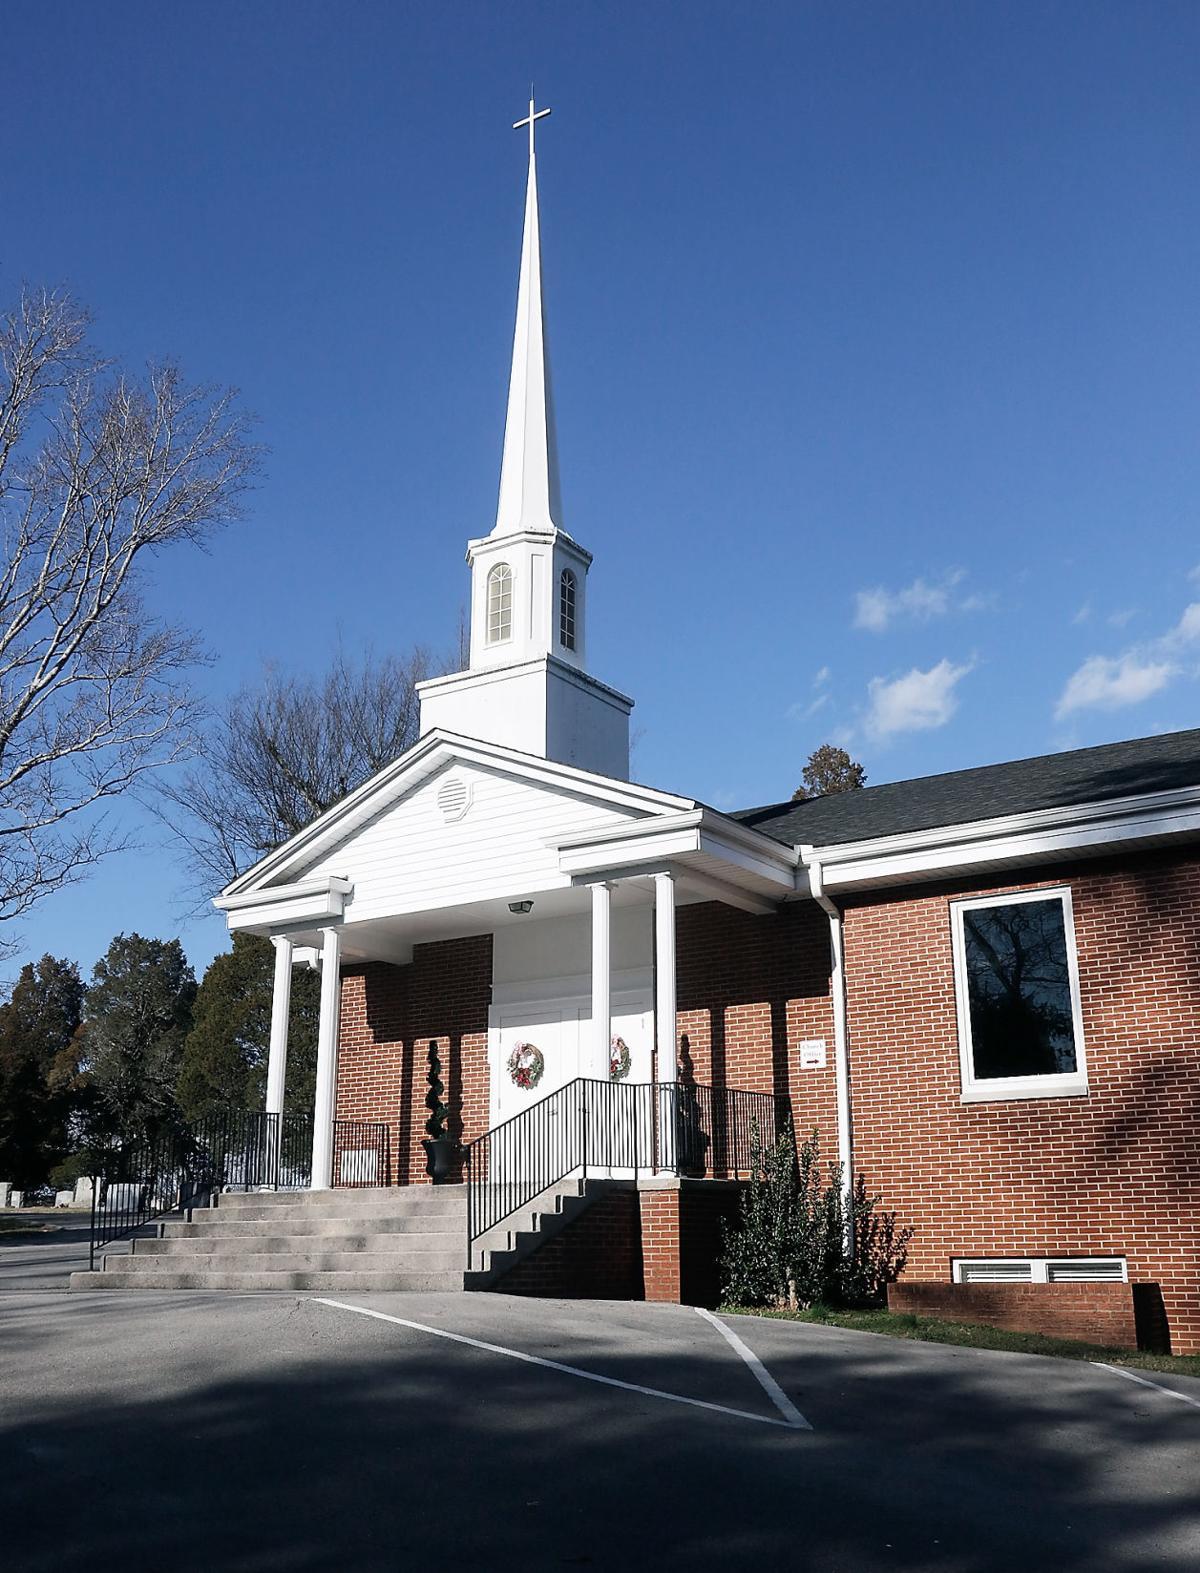 Middsettlements United Methodist Church serves as community hub